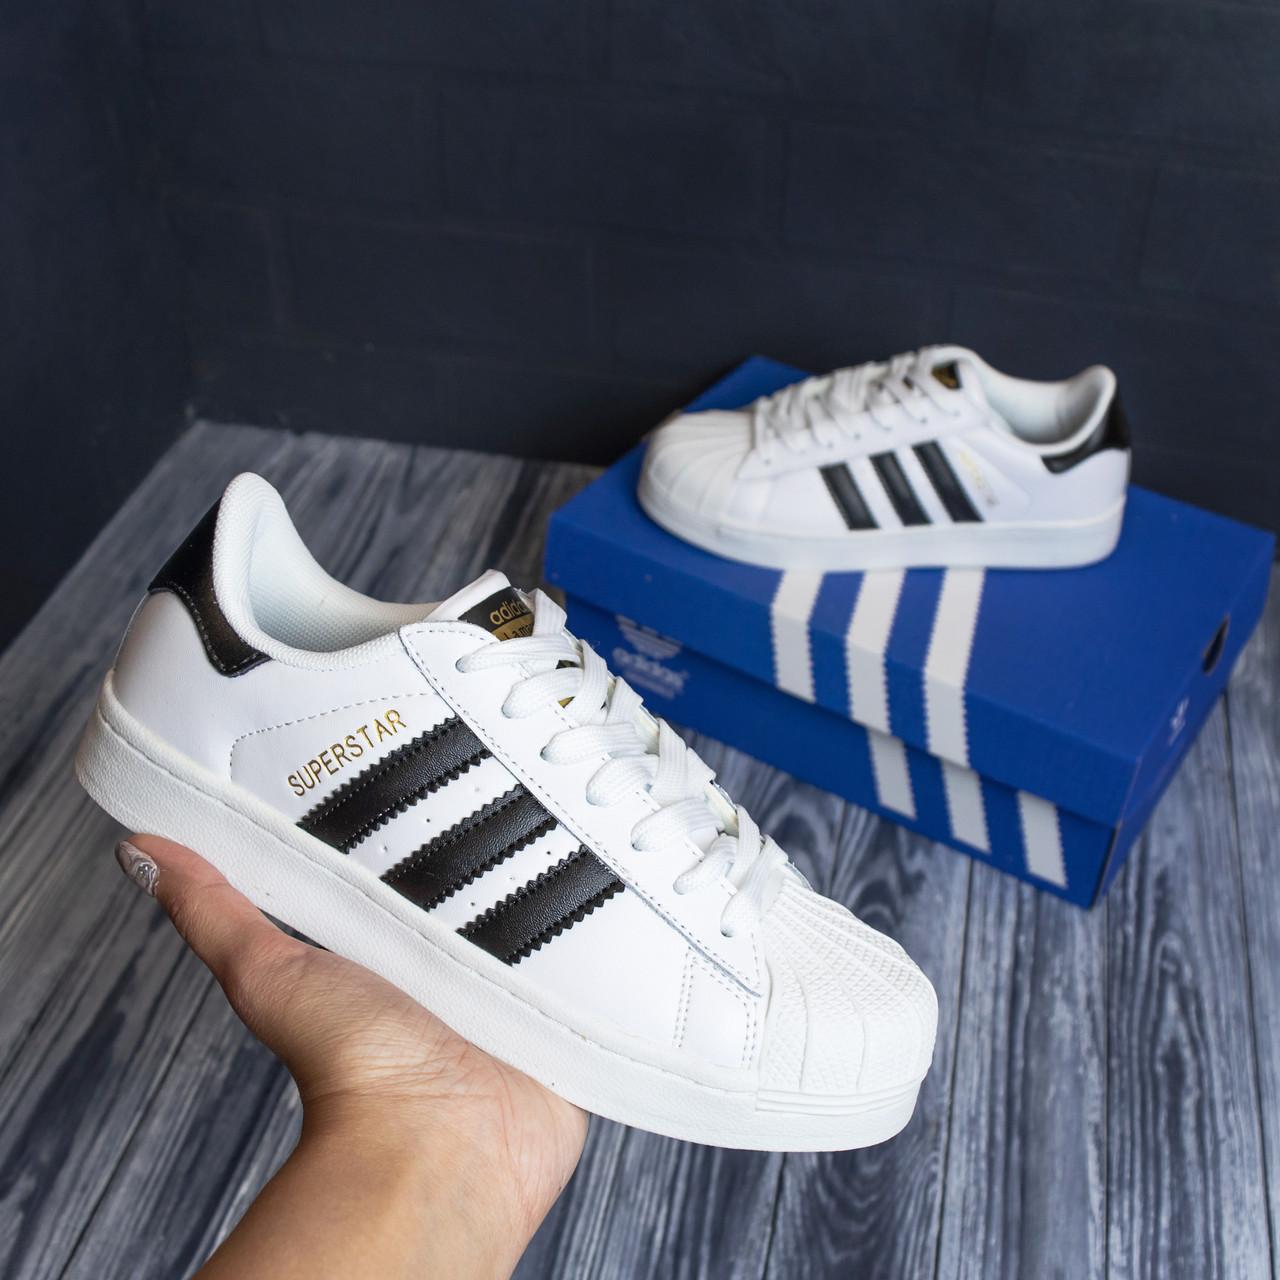 Adidas SuperStar белые кроссовки кеды женские адидас суперстар